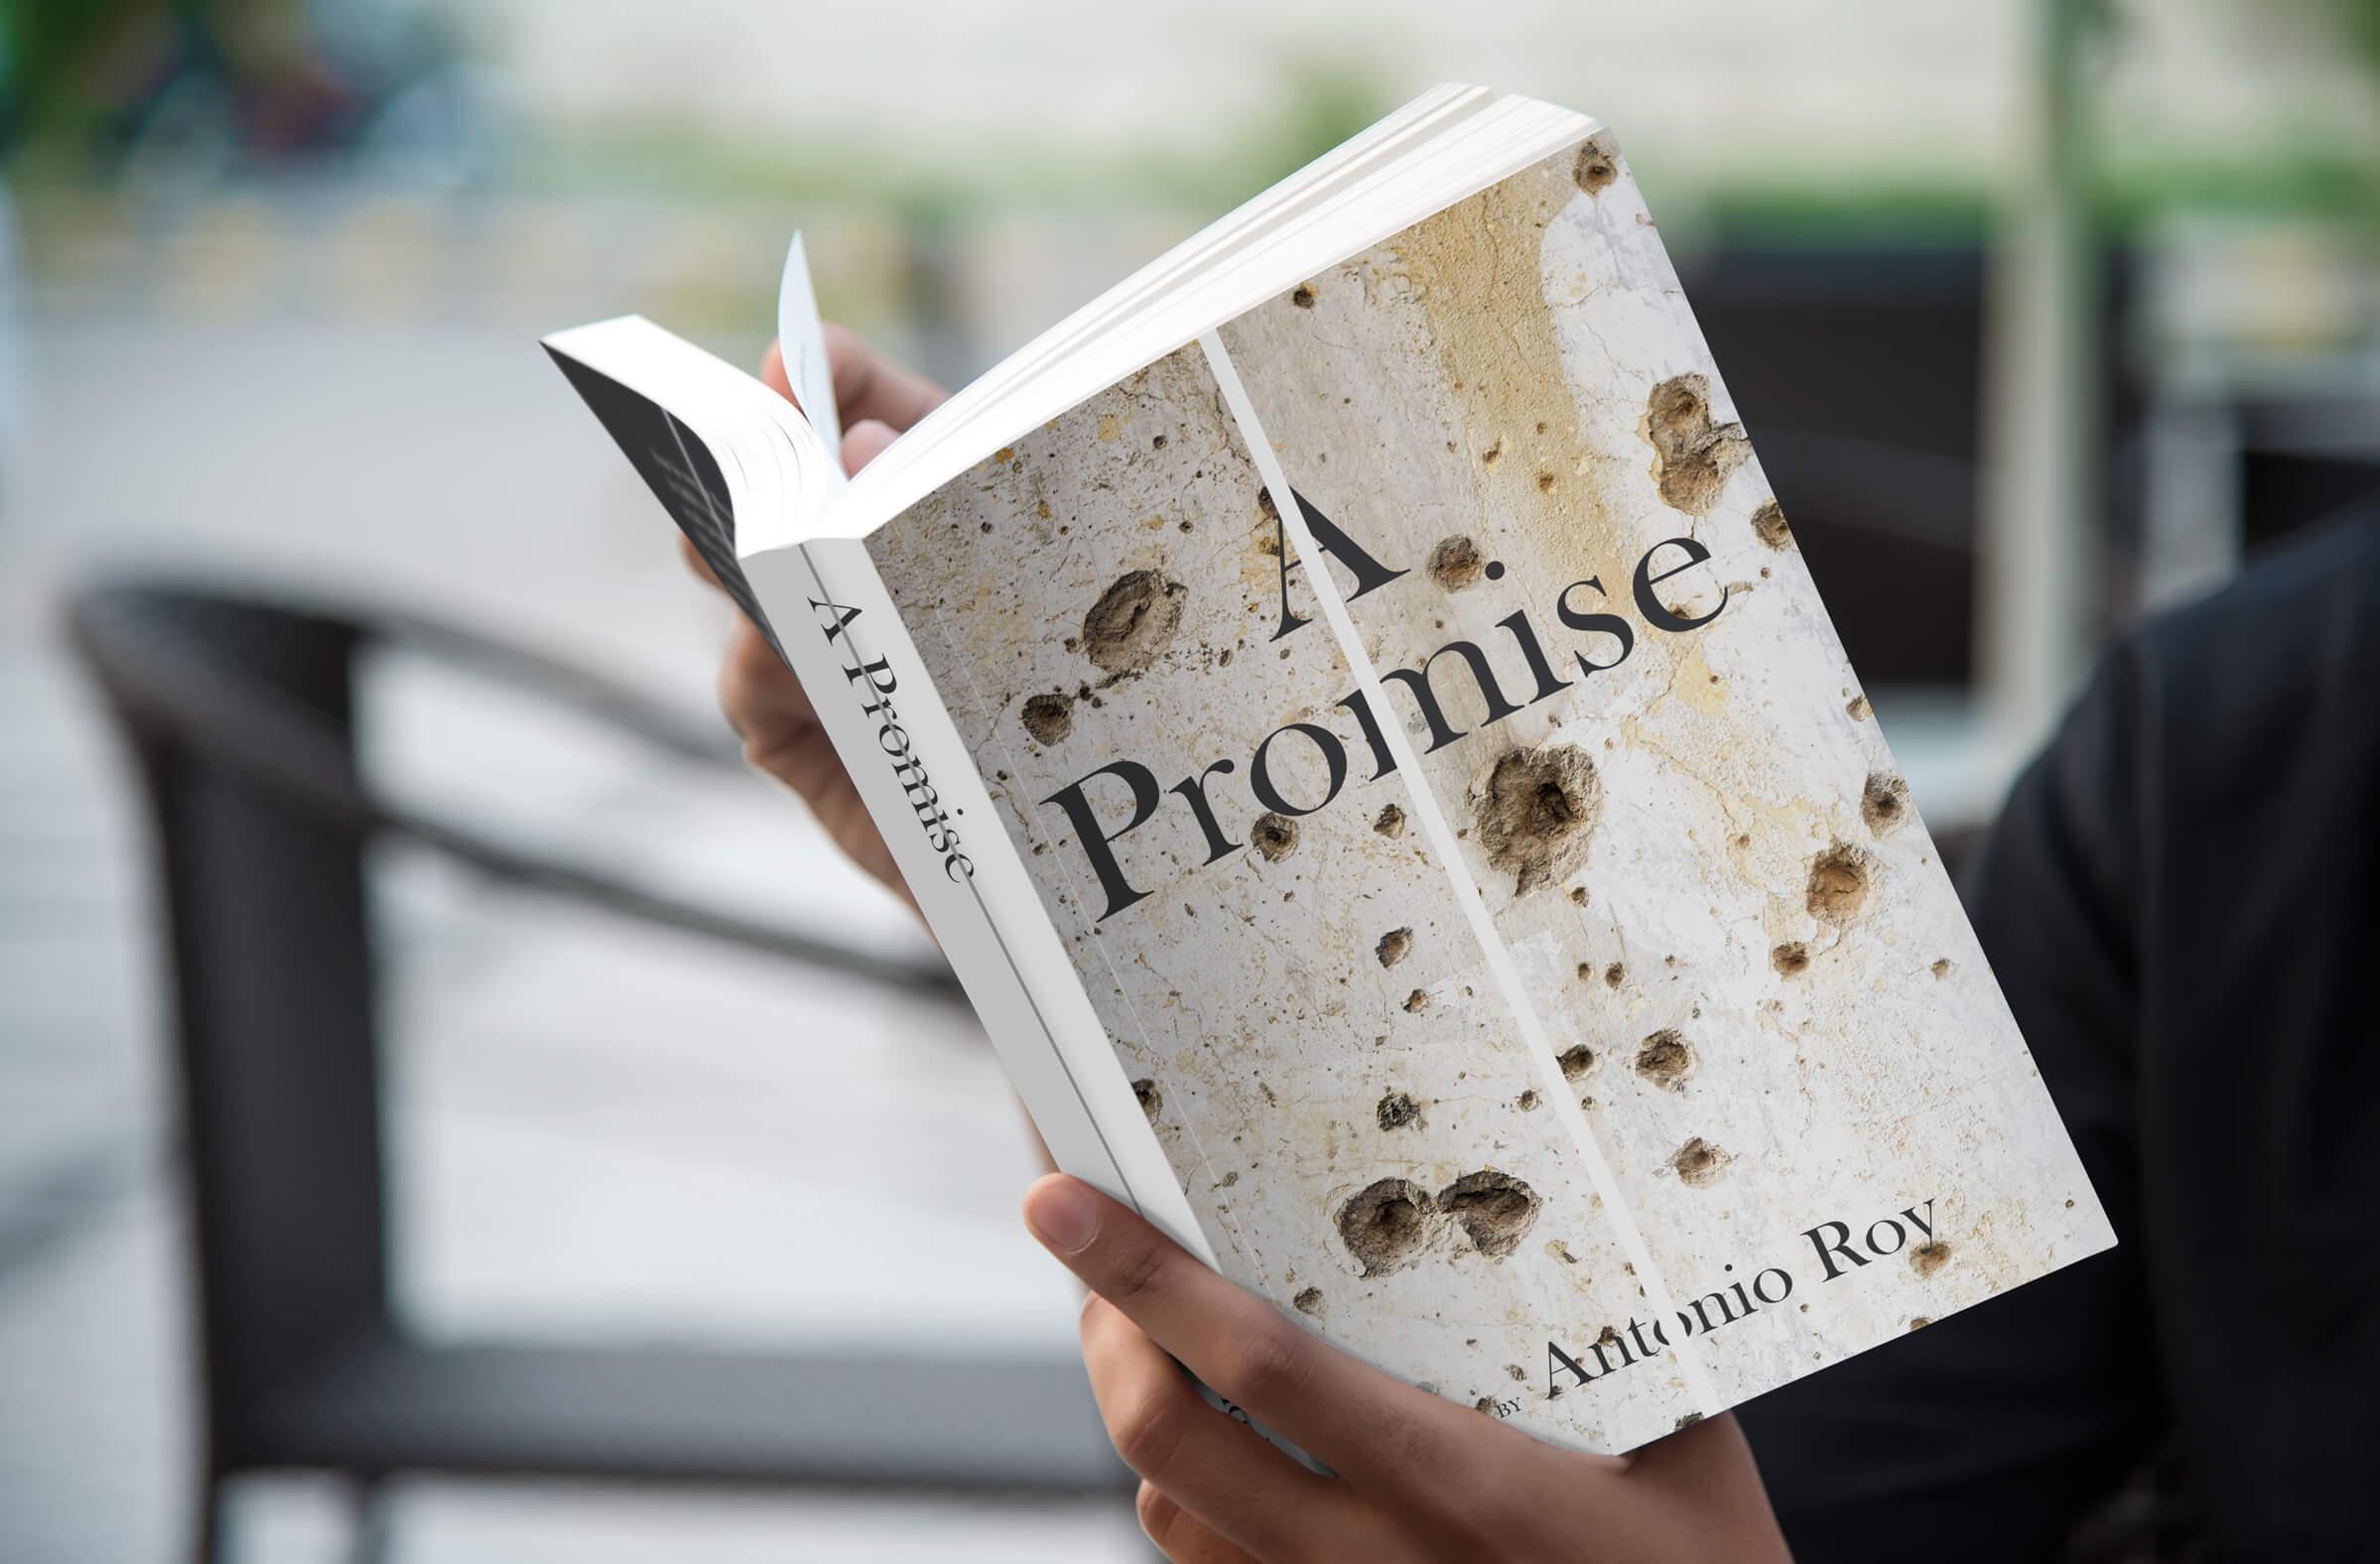 A Promise Book Cover Design 1 by Ottawa Graphic Designer idApostle